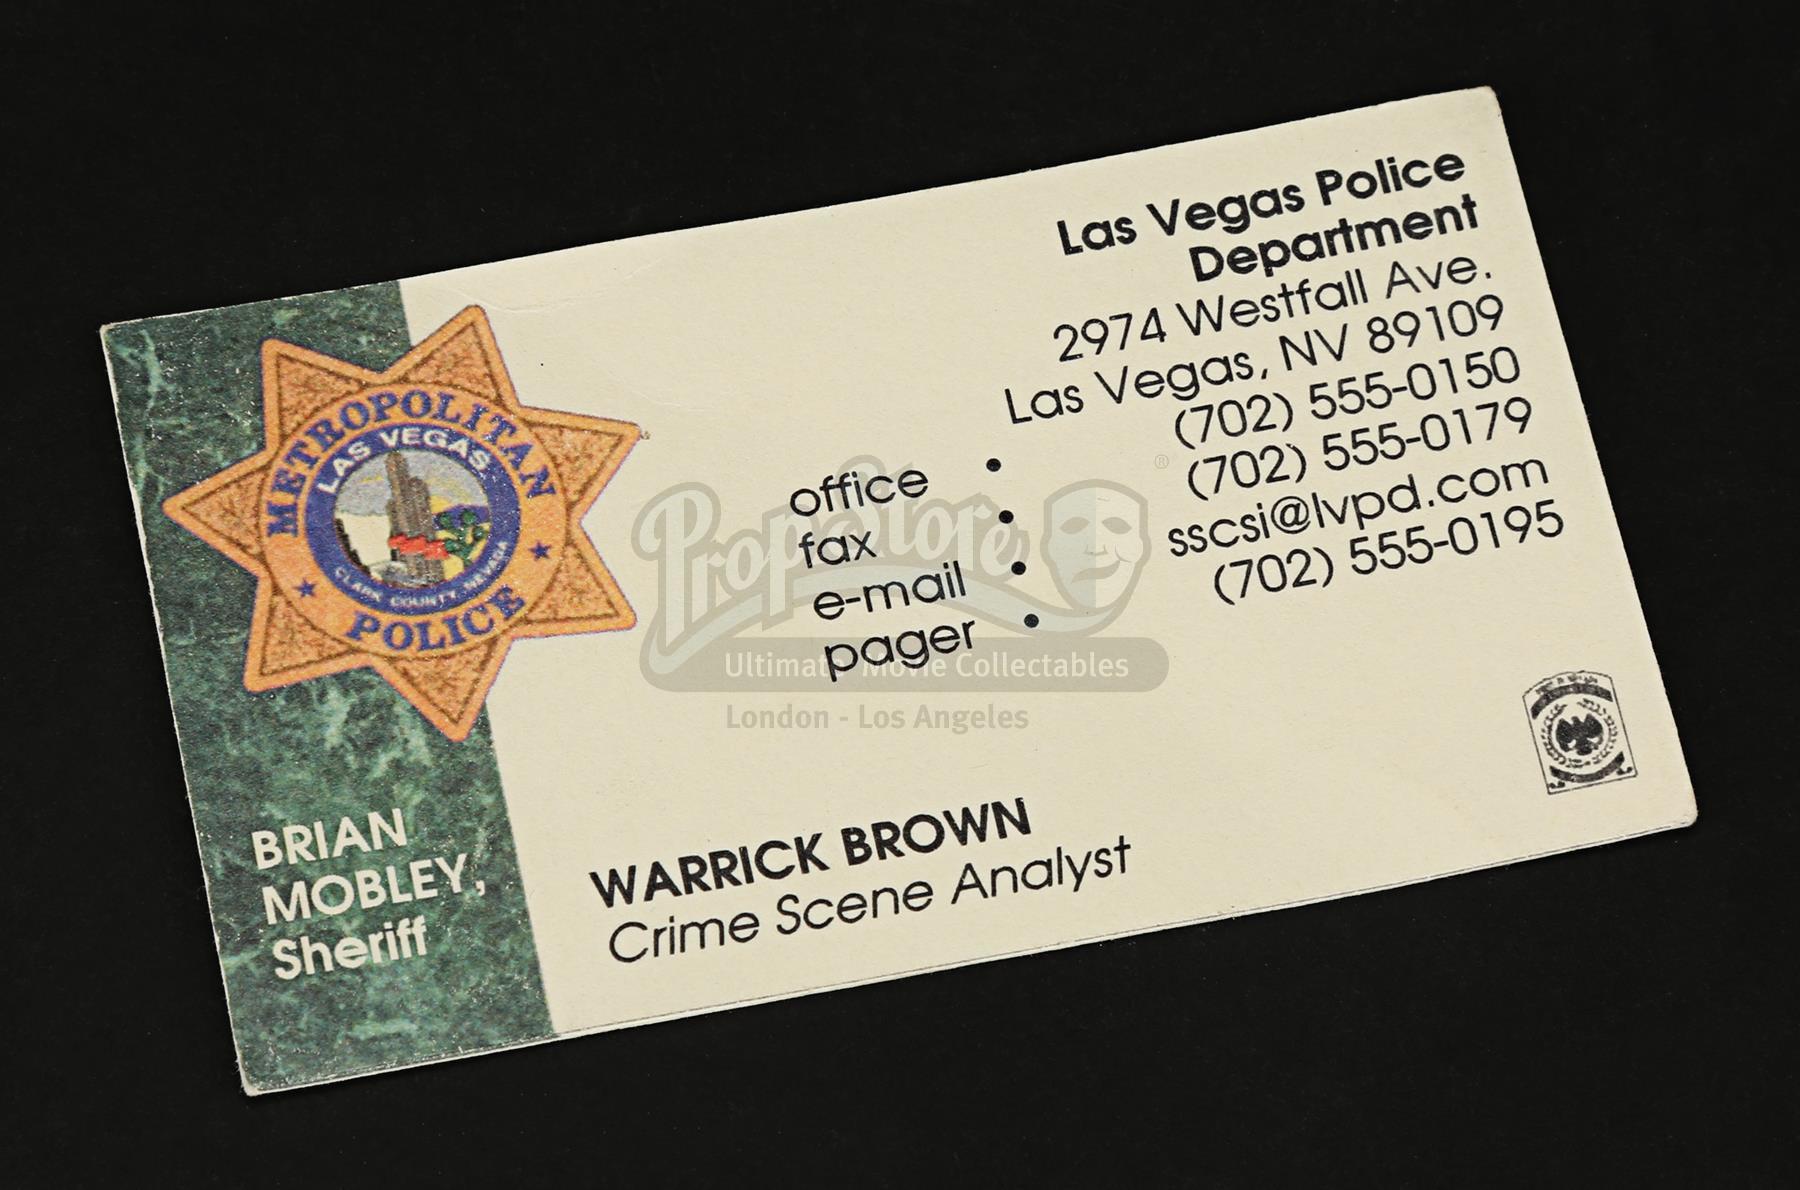 Csi crime scene investigation tv 2000 2015 warrick browns lot 56 reheart Images